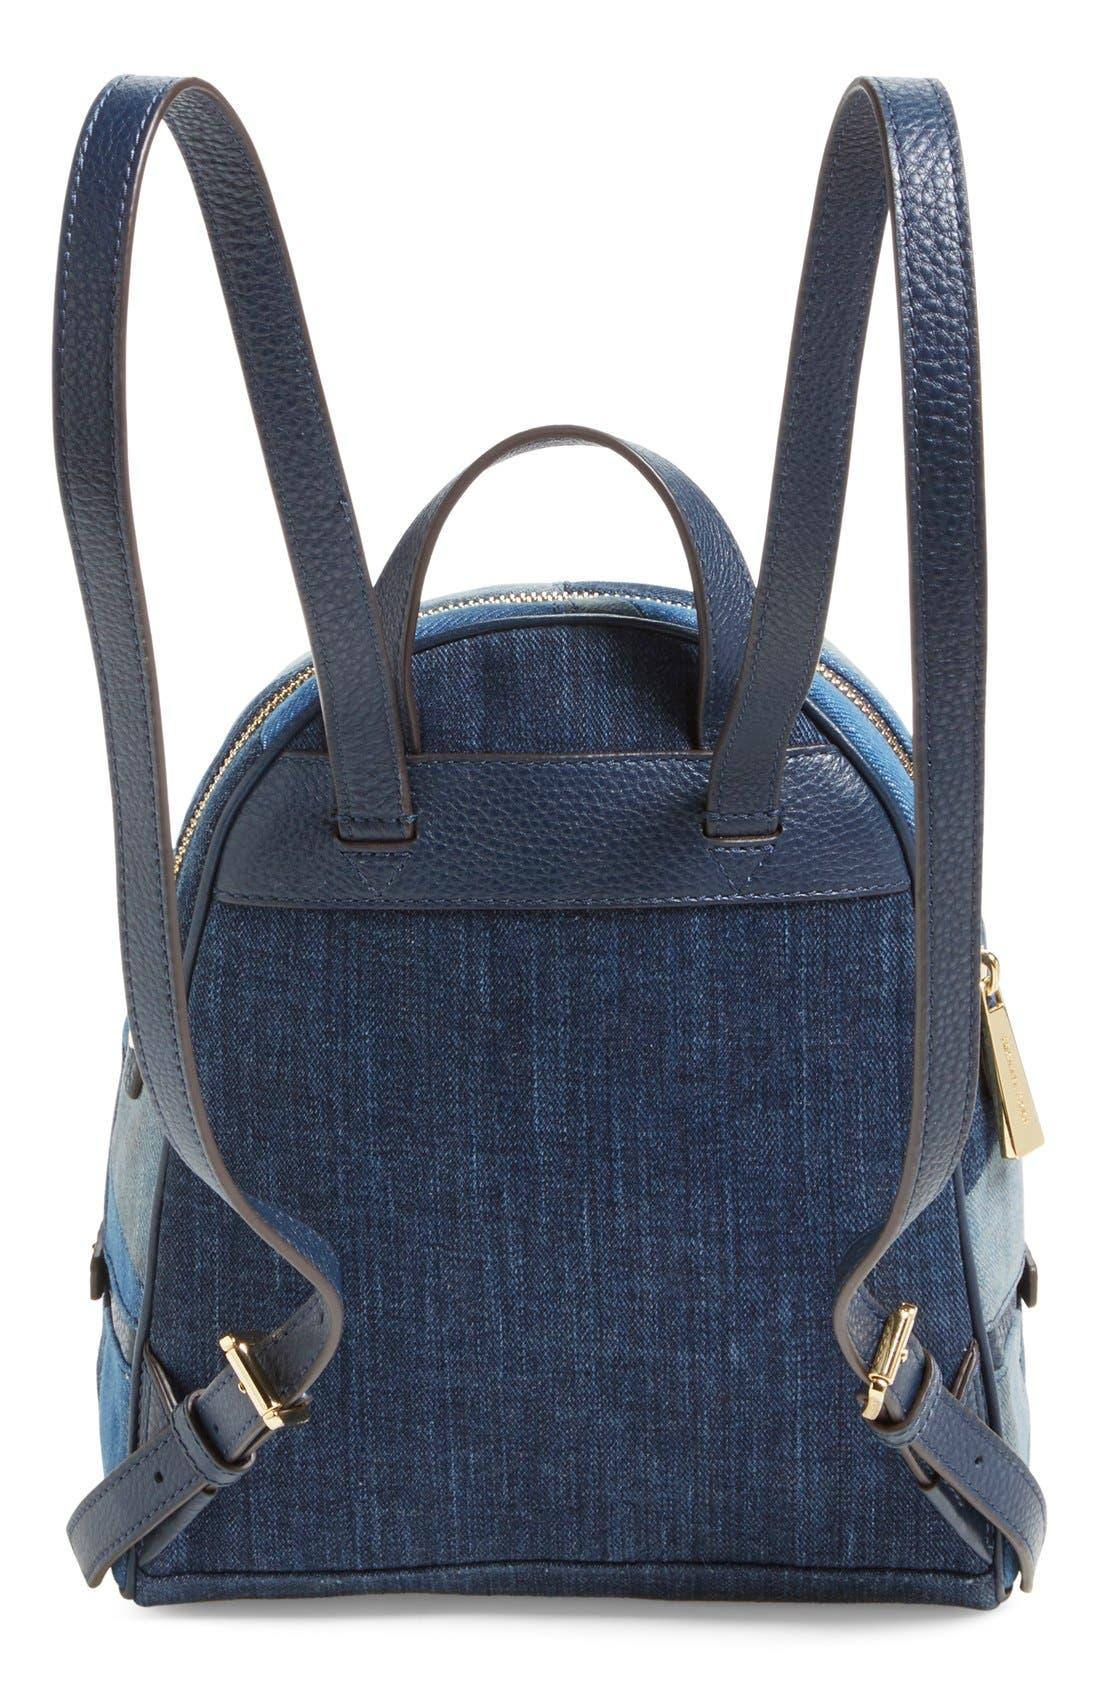 Alternate Image 3  - Michael Kors 'Small Rhea Zip' Denim Backpack